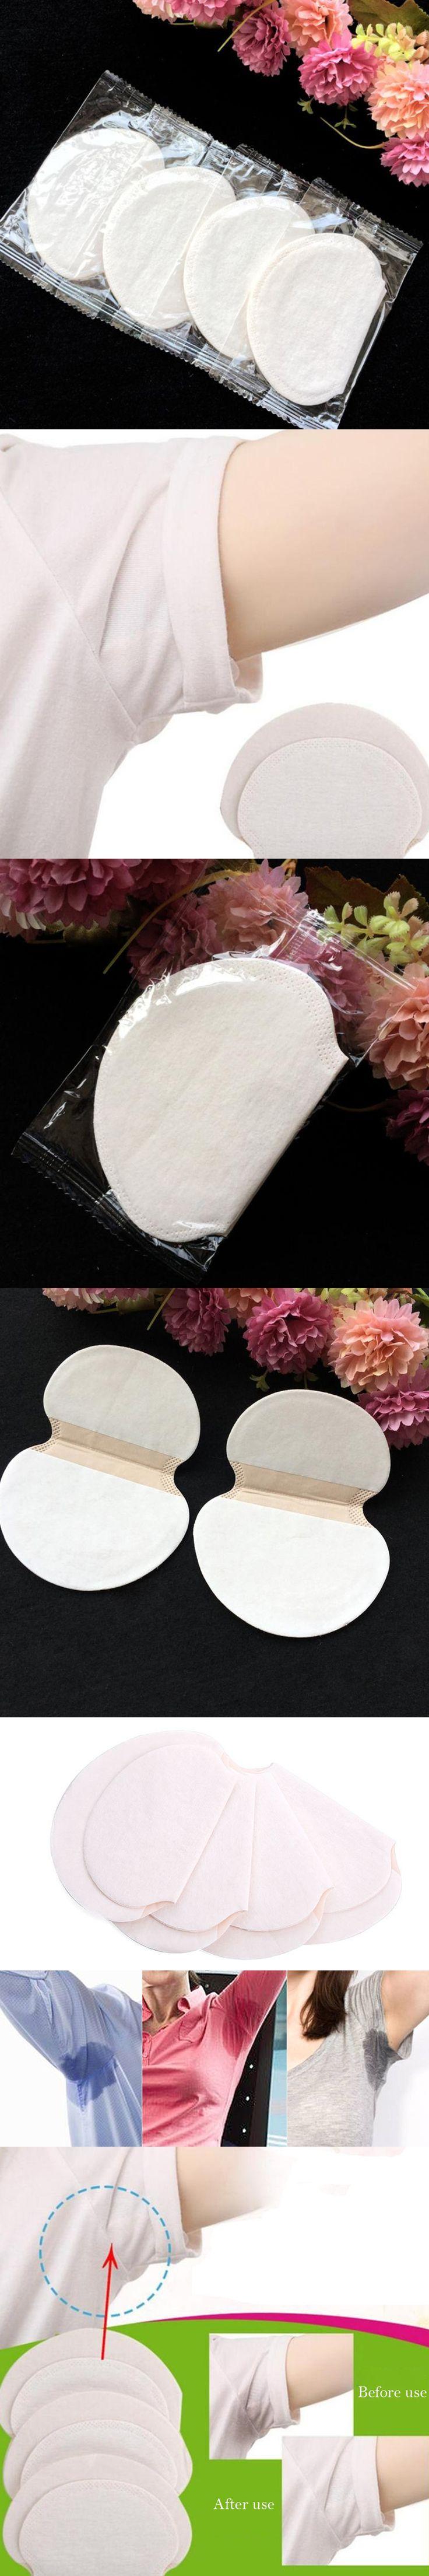 50pc Disposable Anti Sweat Pad Underarm Sweat Dress Clothing Armpit Guard Pads Sheet Shield Absorbing Perspiration